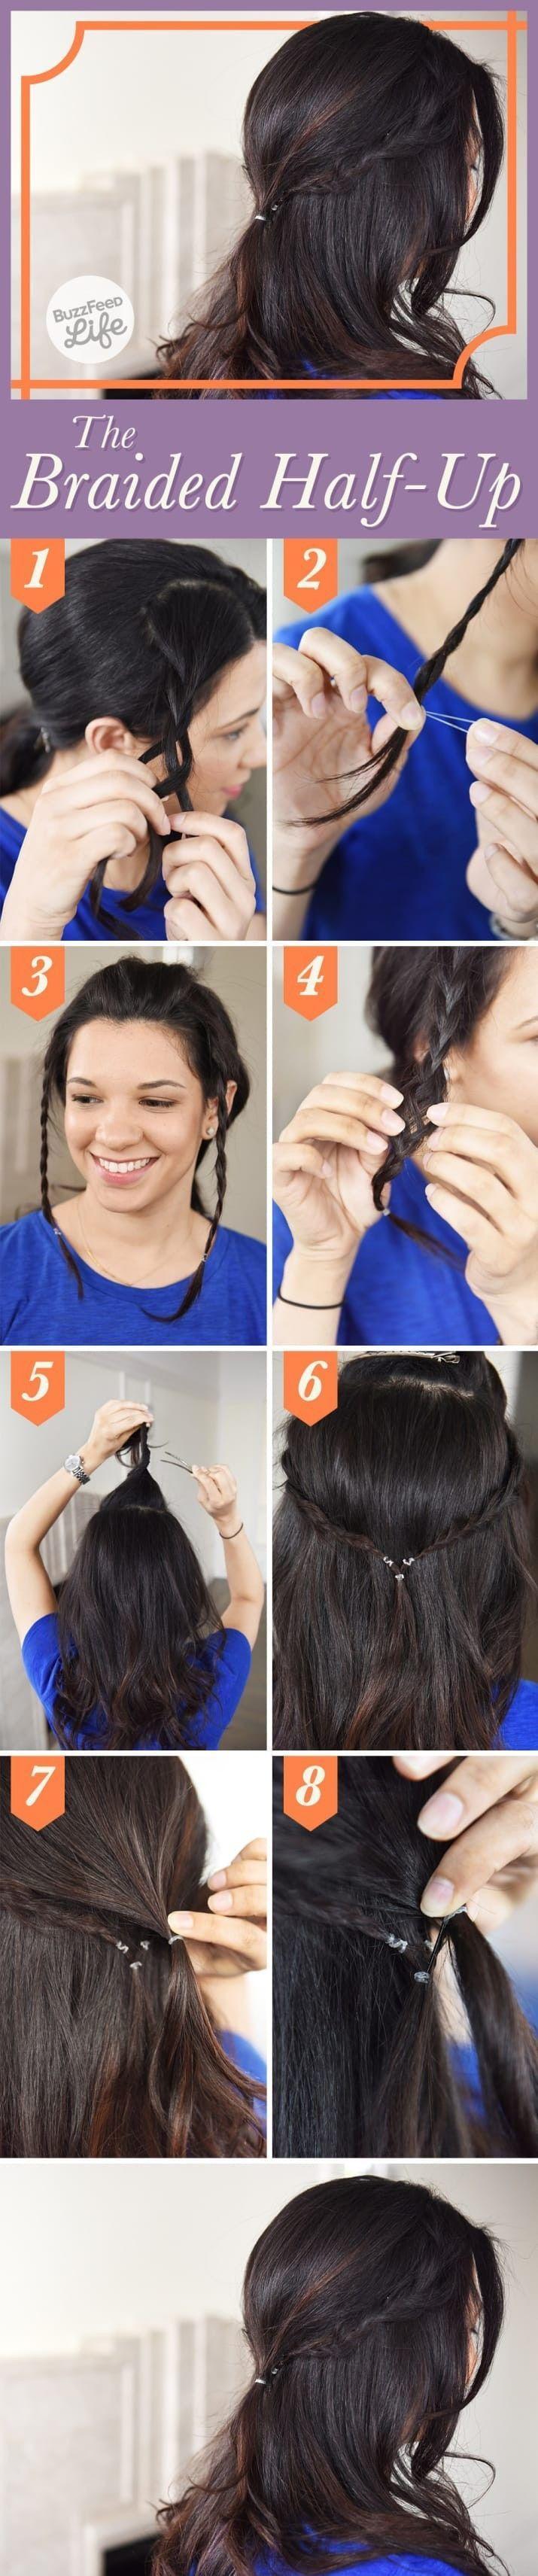 50 Genial Geflochtene Frisuren Fur Kurzes Haar Step By Step Dailymotion Hair Styles Braids For Short Hair Cool Hairstyles